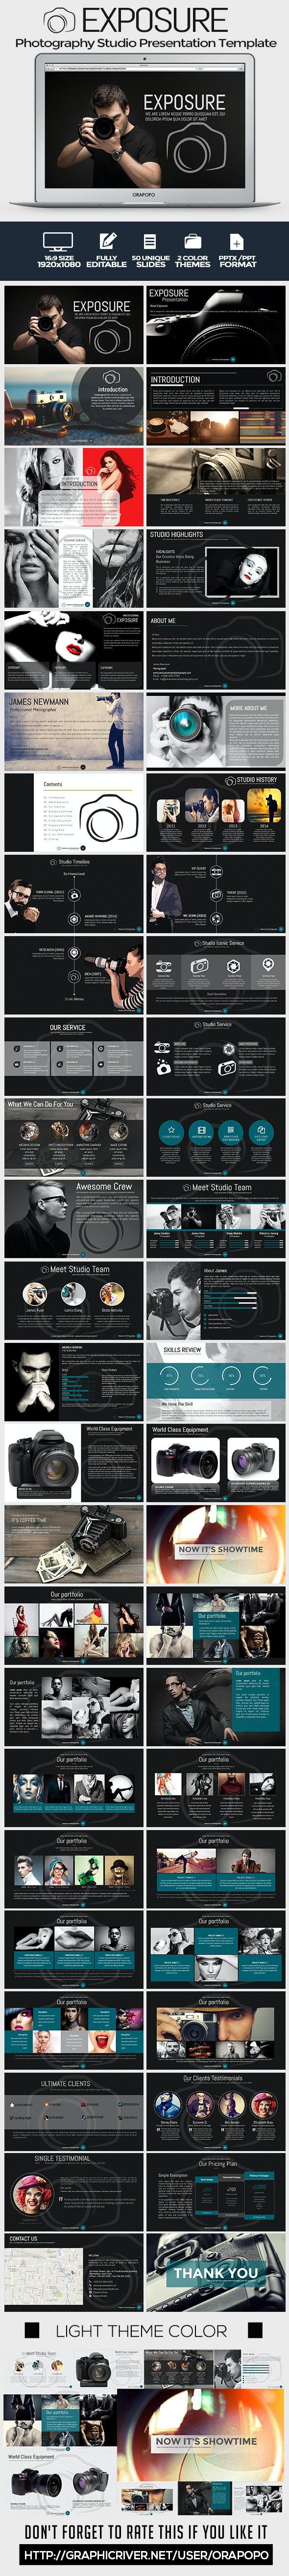 Exposure Photography Studio Presentation Template - Creative PowerPoint Templates